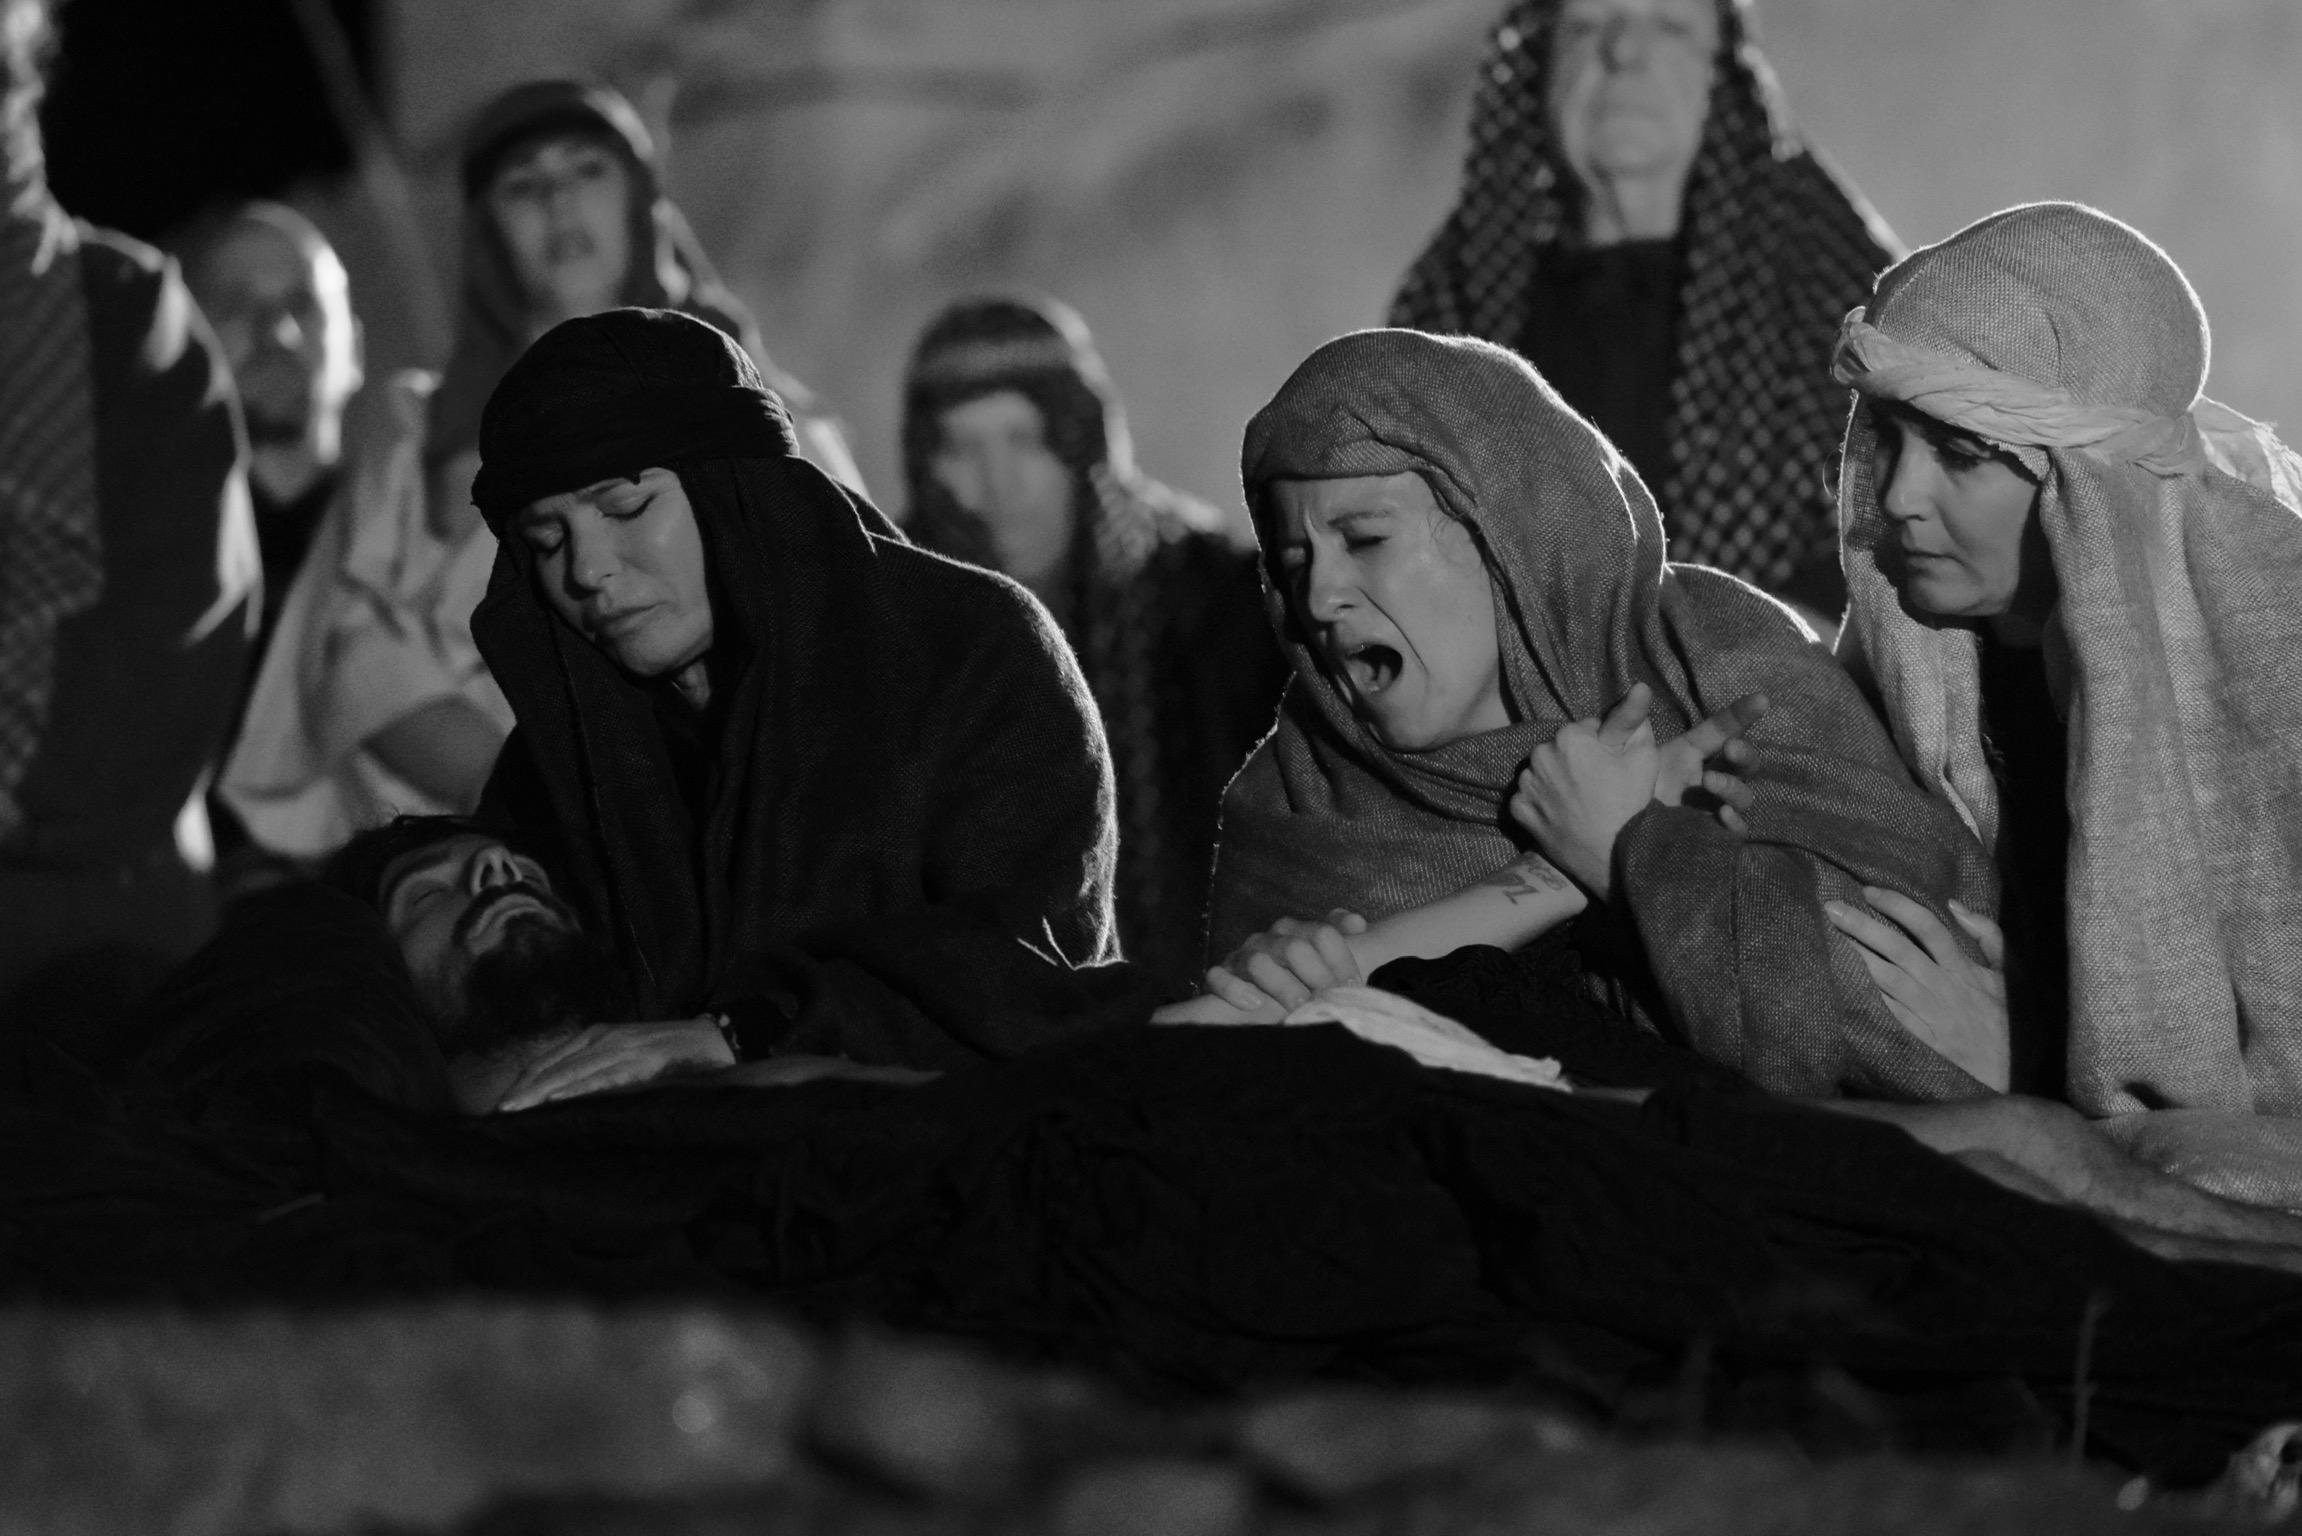 A Settimana Santa, moment important de la vie religieuse insulaire